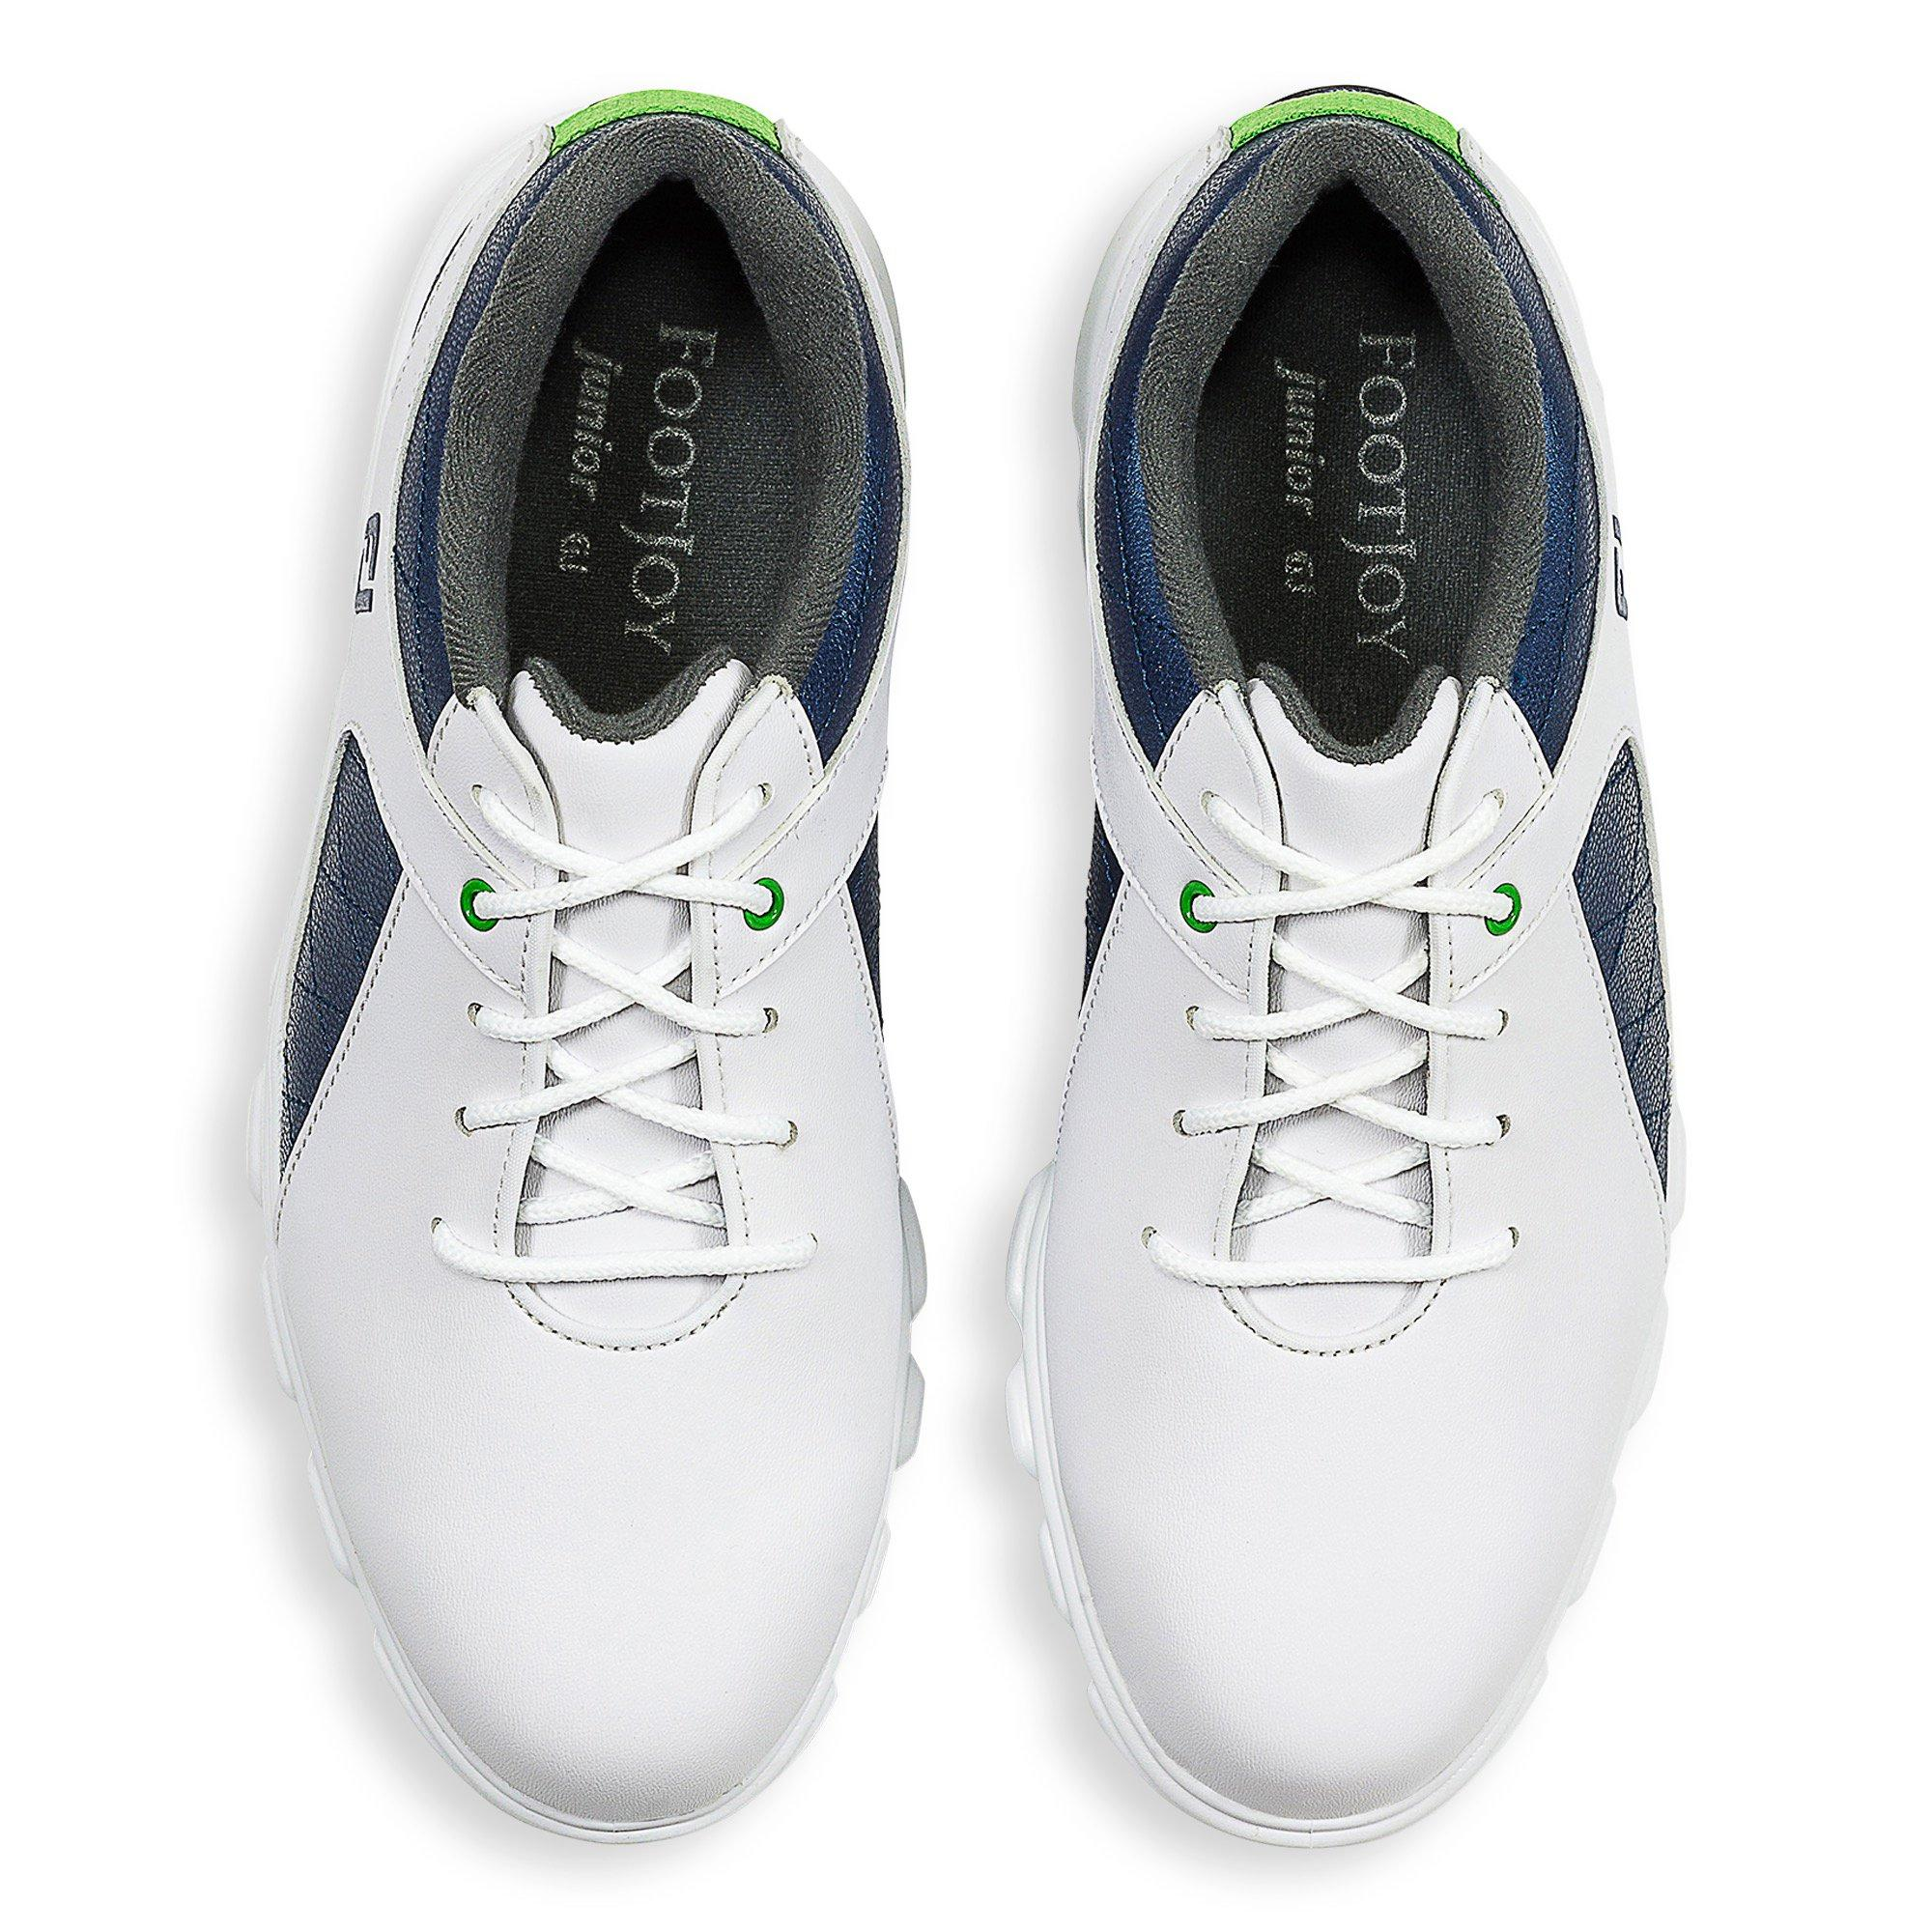 Junior Pro SL Spikelss Golf Shoe